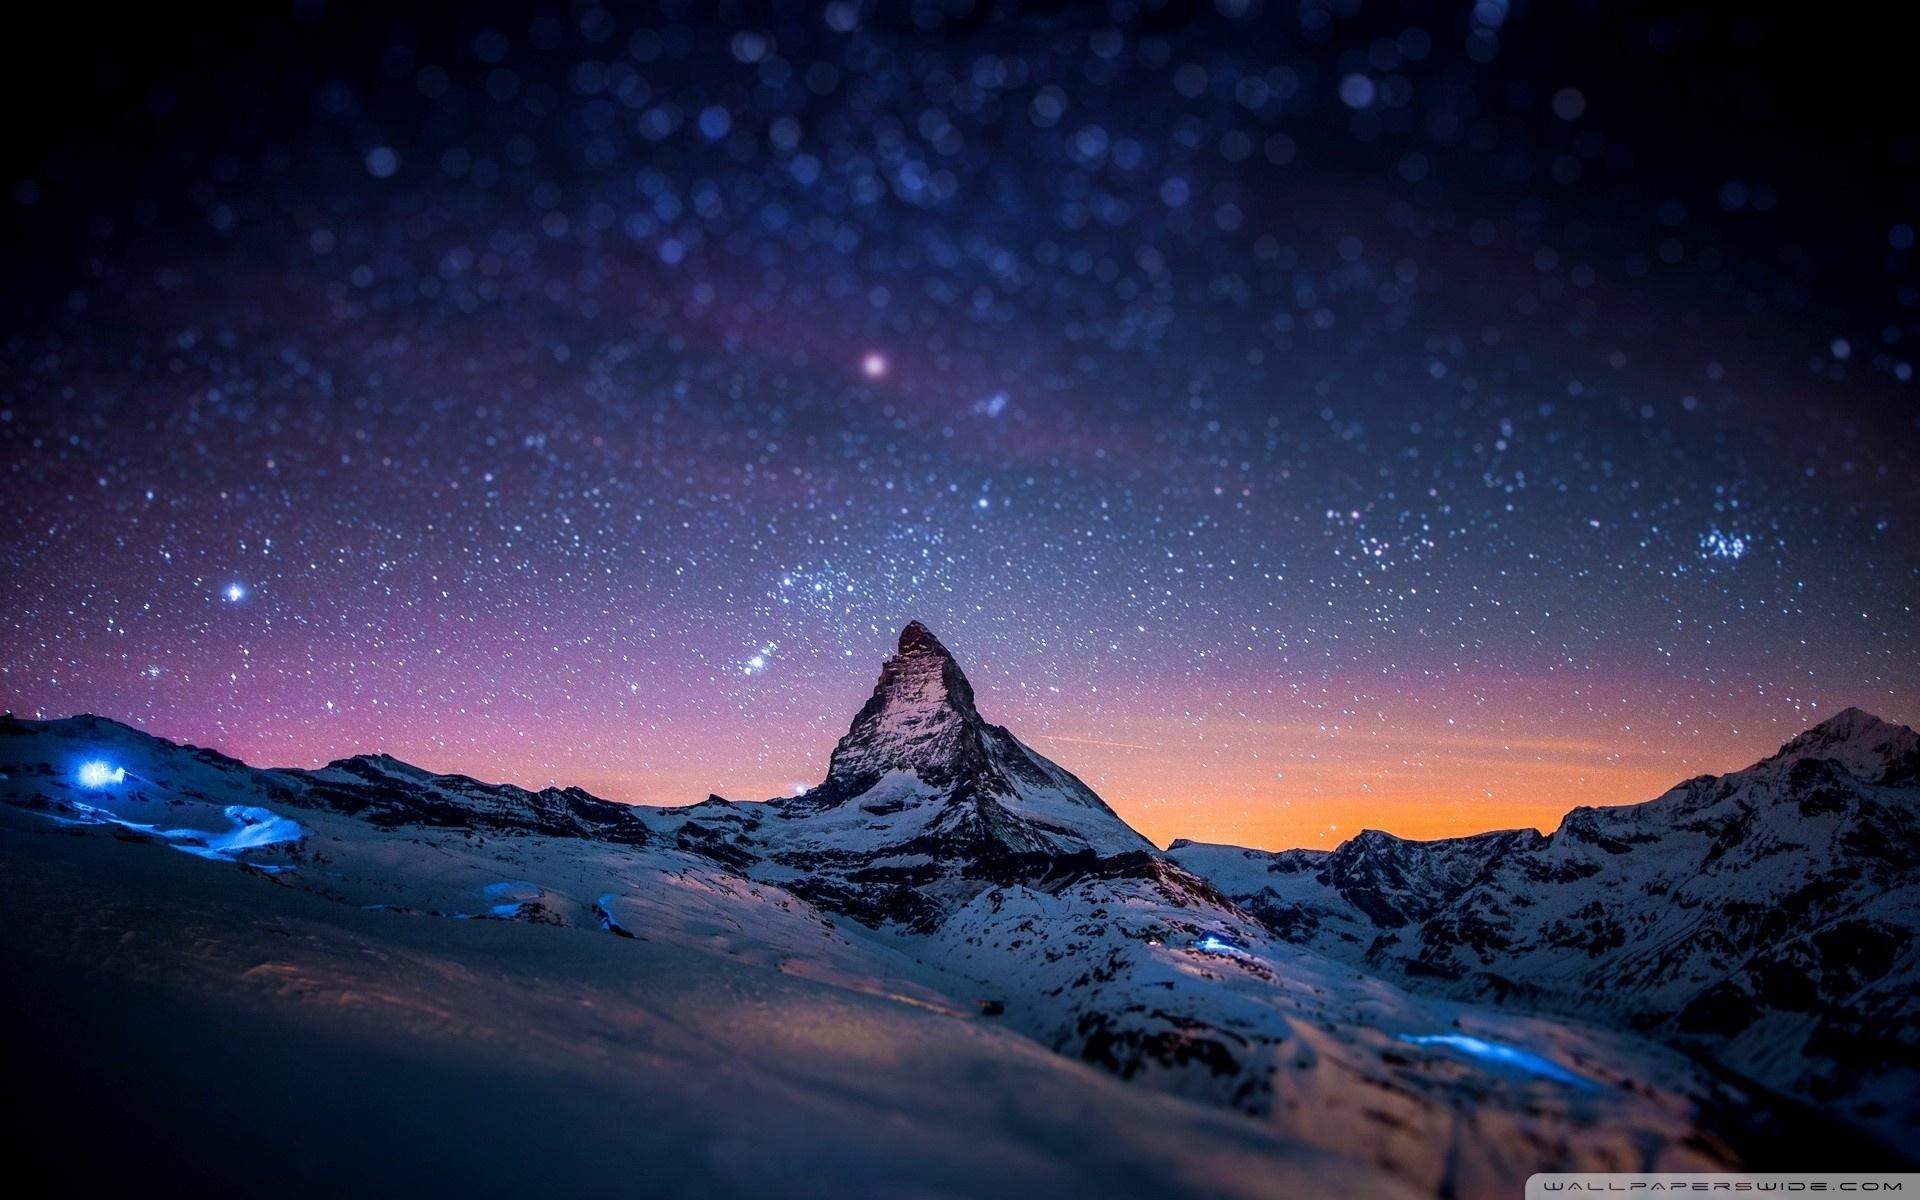 mountain at night ❤ 4k hd desktop wallpaper for 4k ultra hd tv